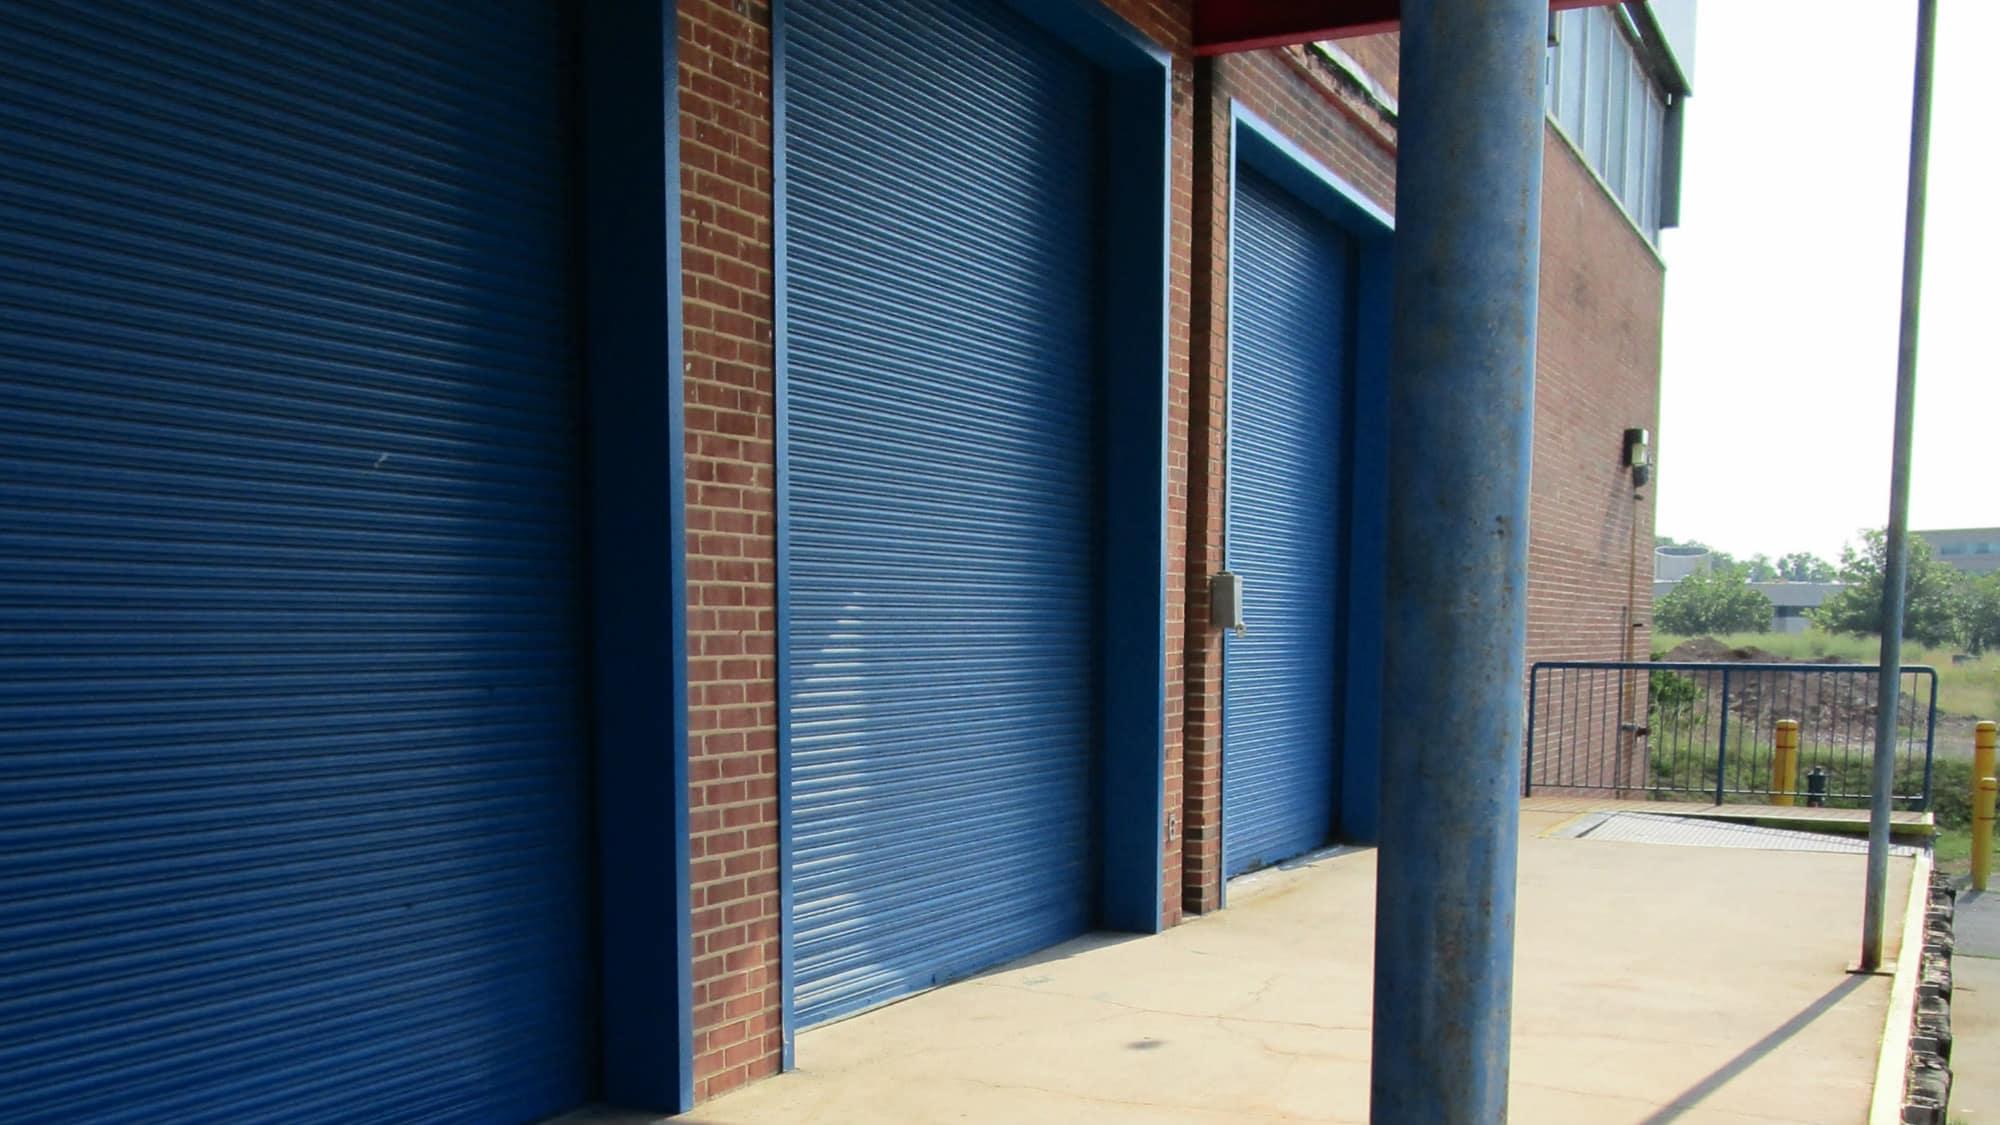 Storage units with blue doors at Self Storage Plus in Lanham, MD